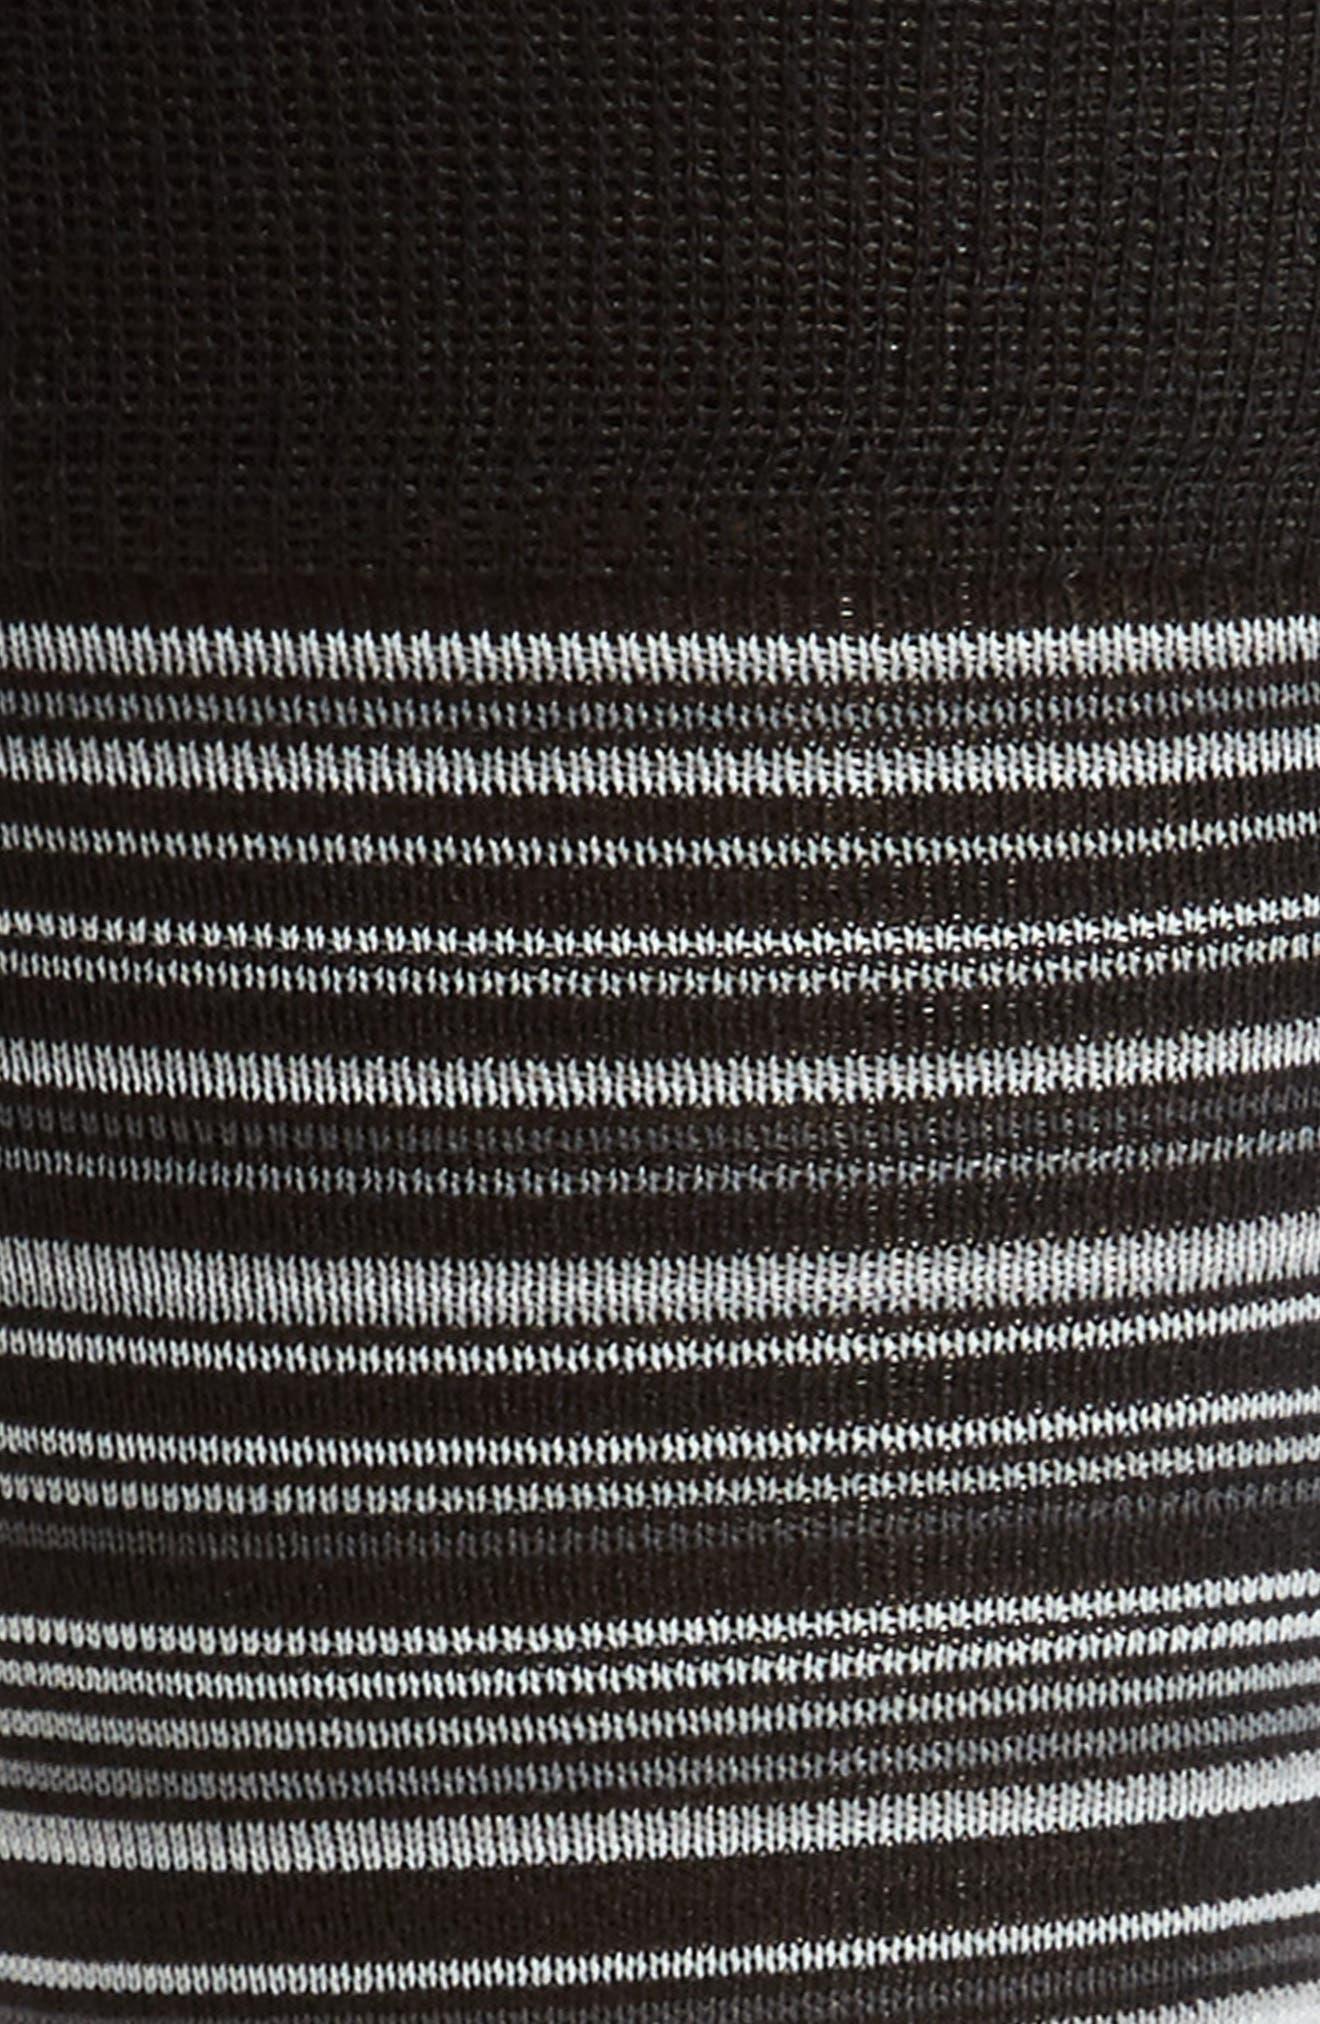 COLE HAAN, Multistripe Crew Socks, Alternate thumbnail 2, color, BLACK/ GREY